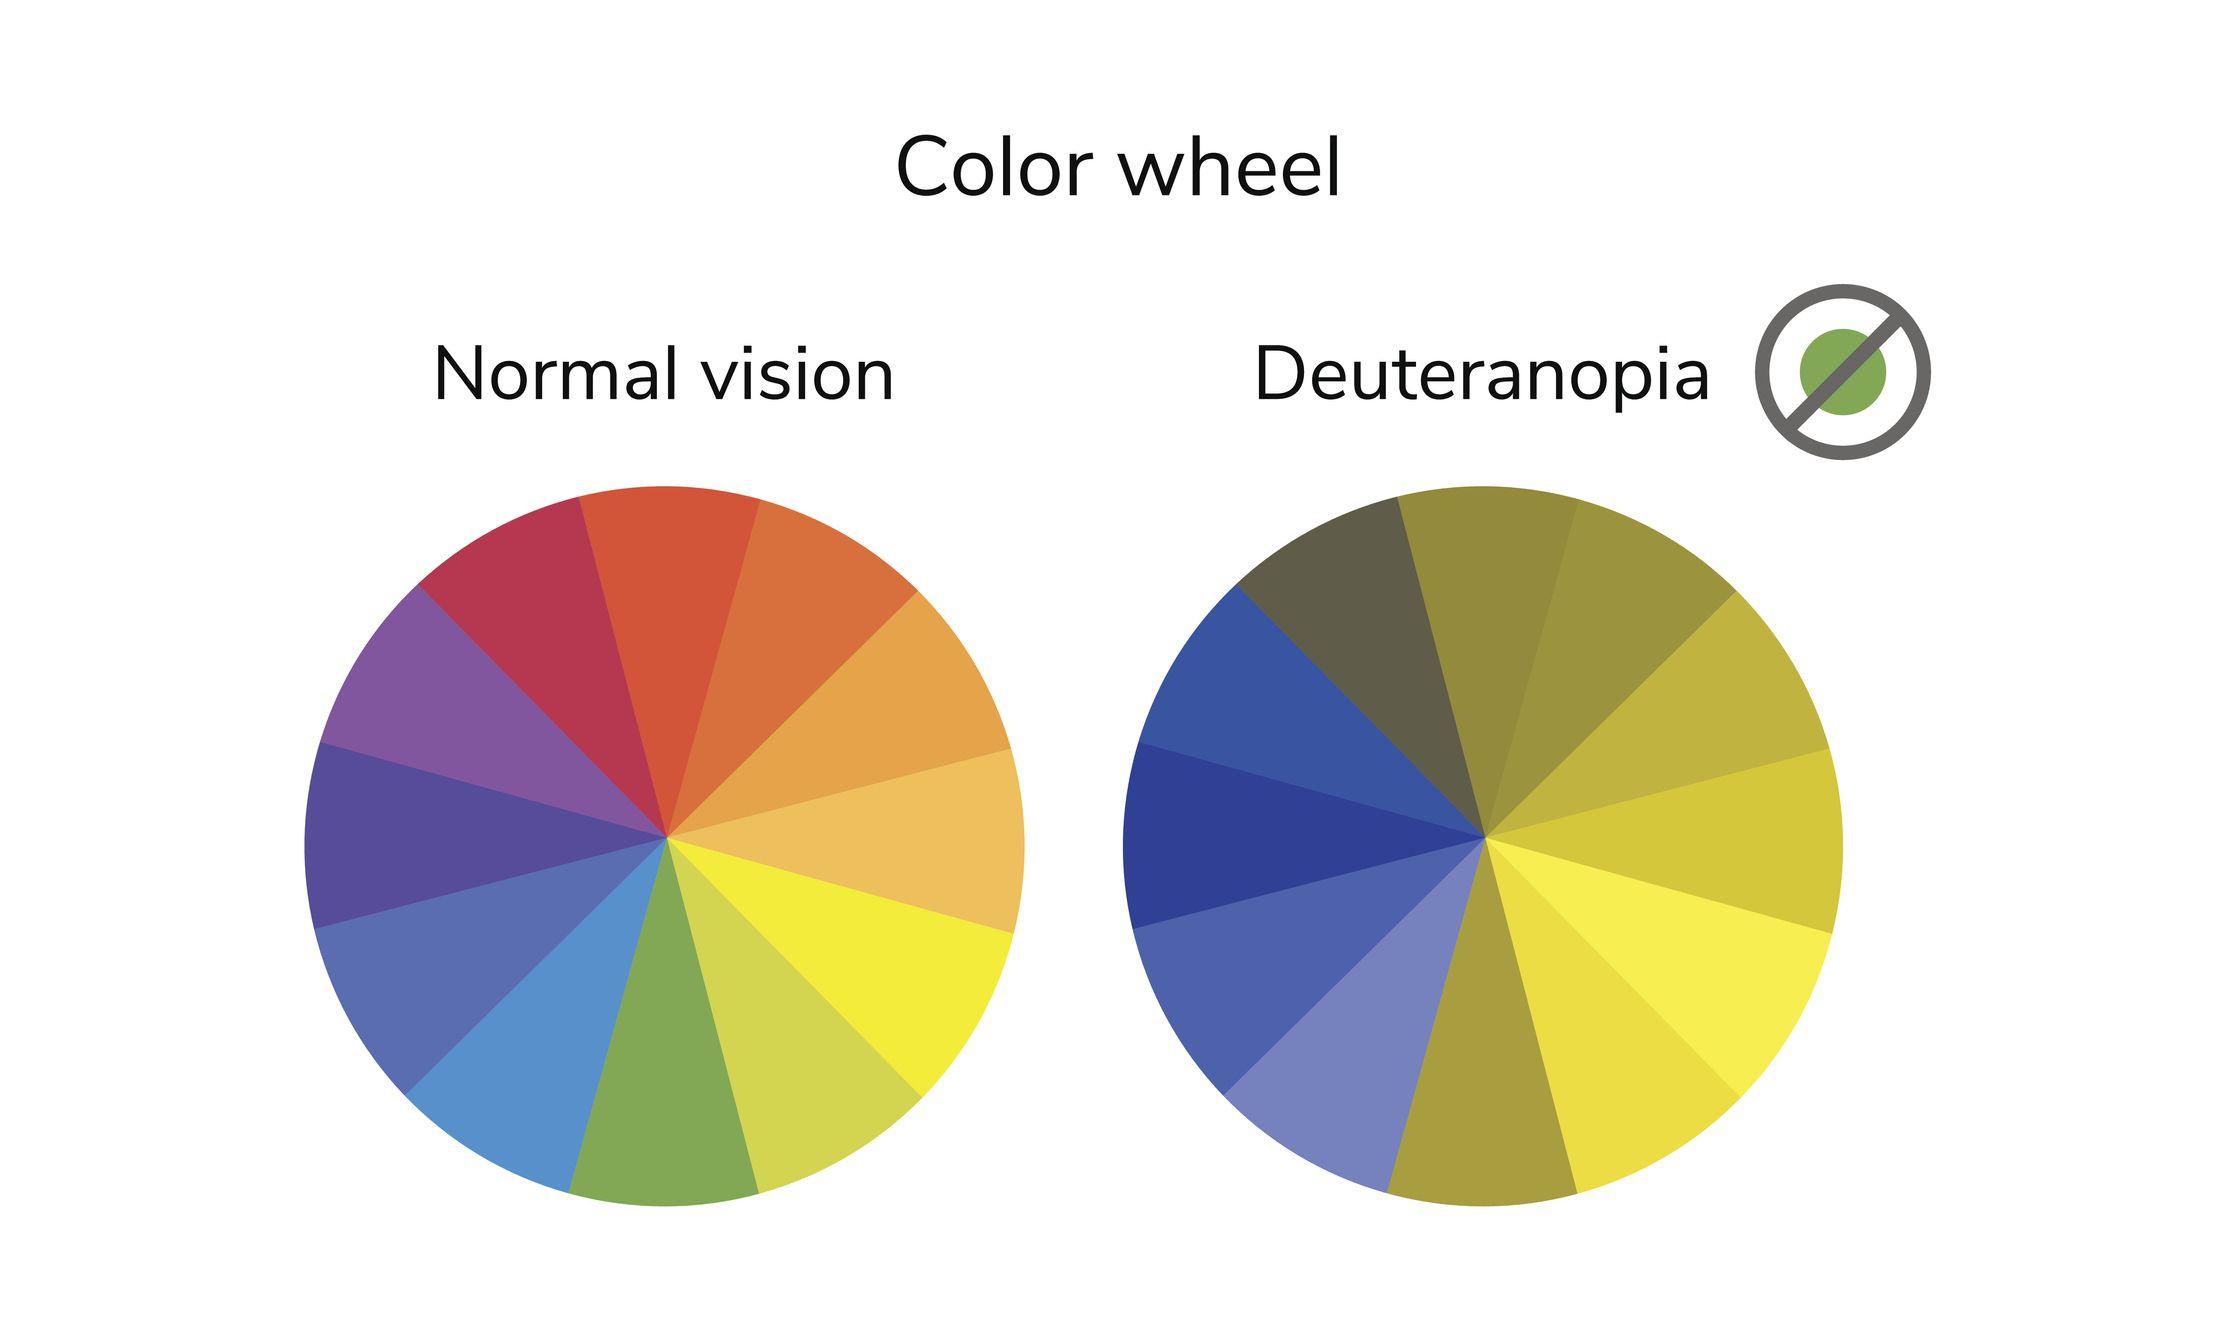 color wheel showing normal vision and deuteranopia vision